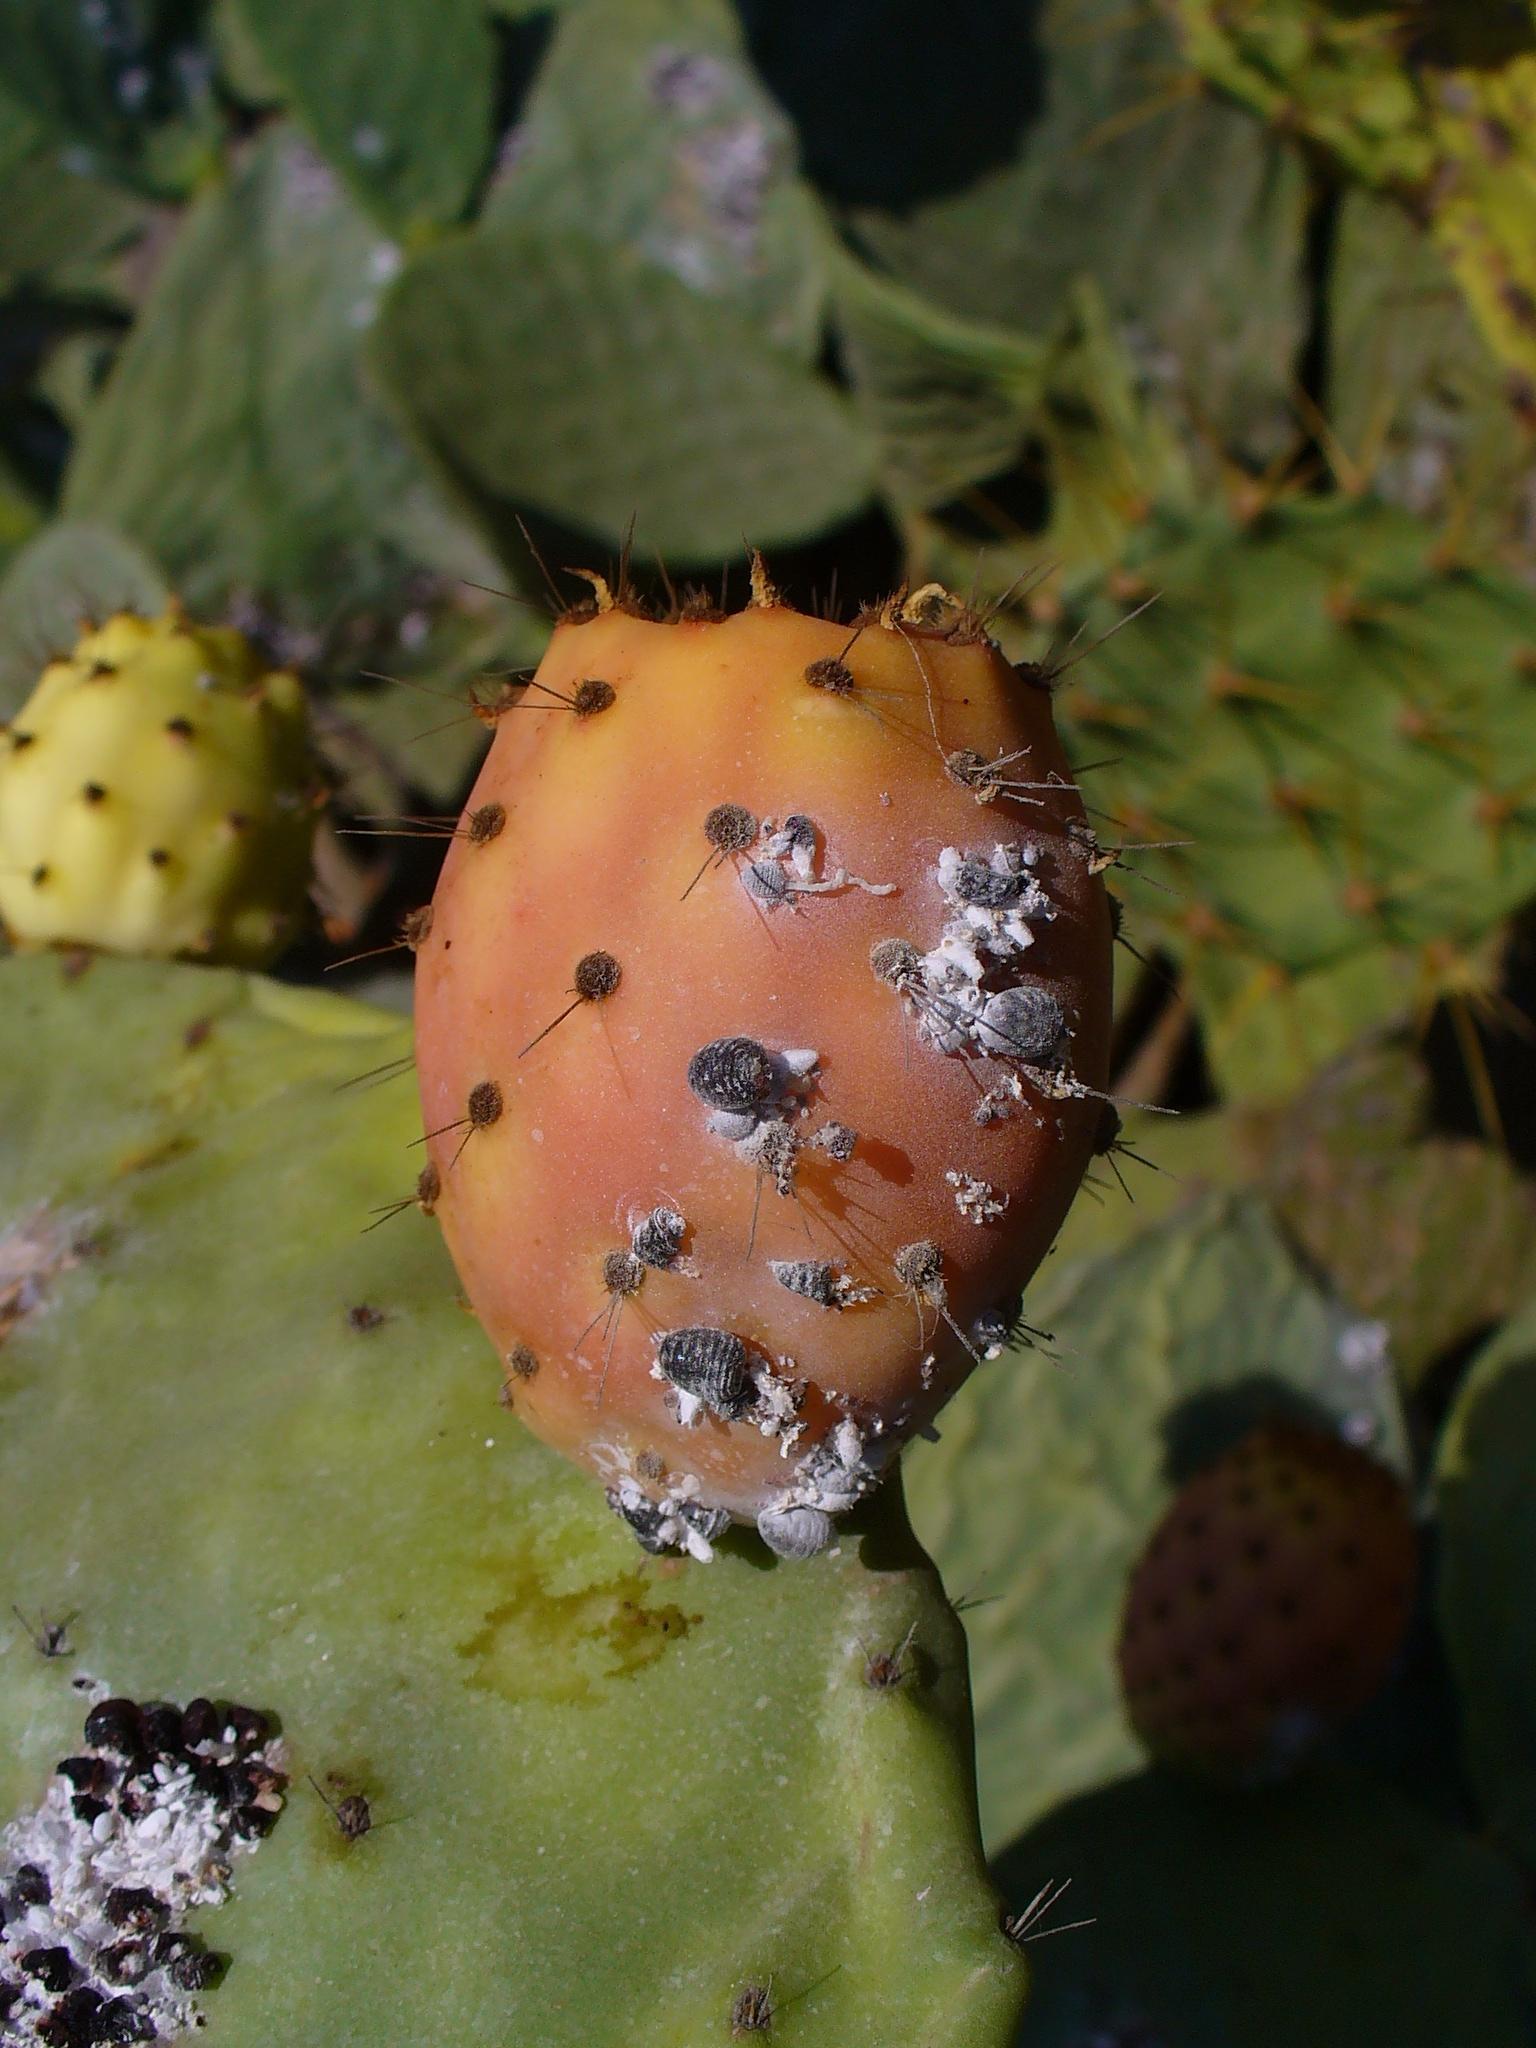 File:Dactylopius coccus 05.JPG - Wikimedia Commons Dactylopiidae